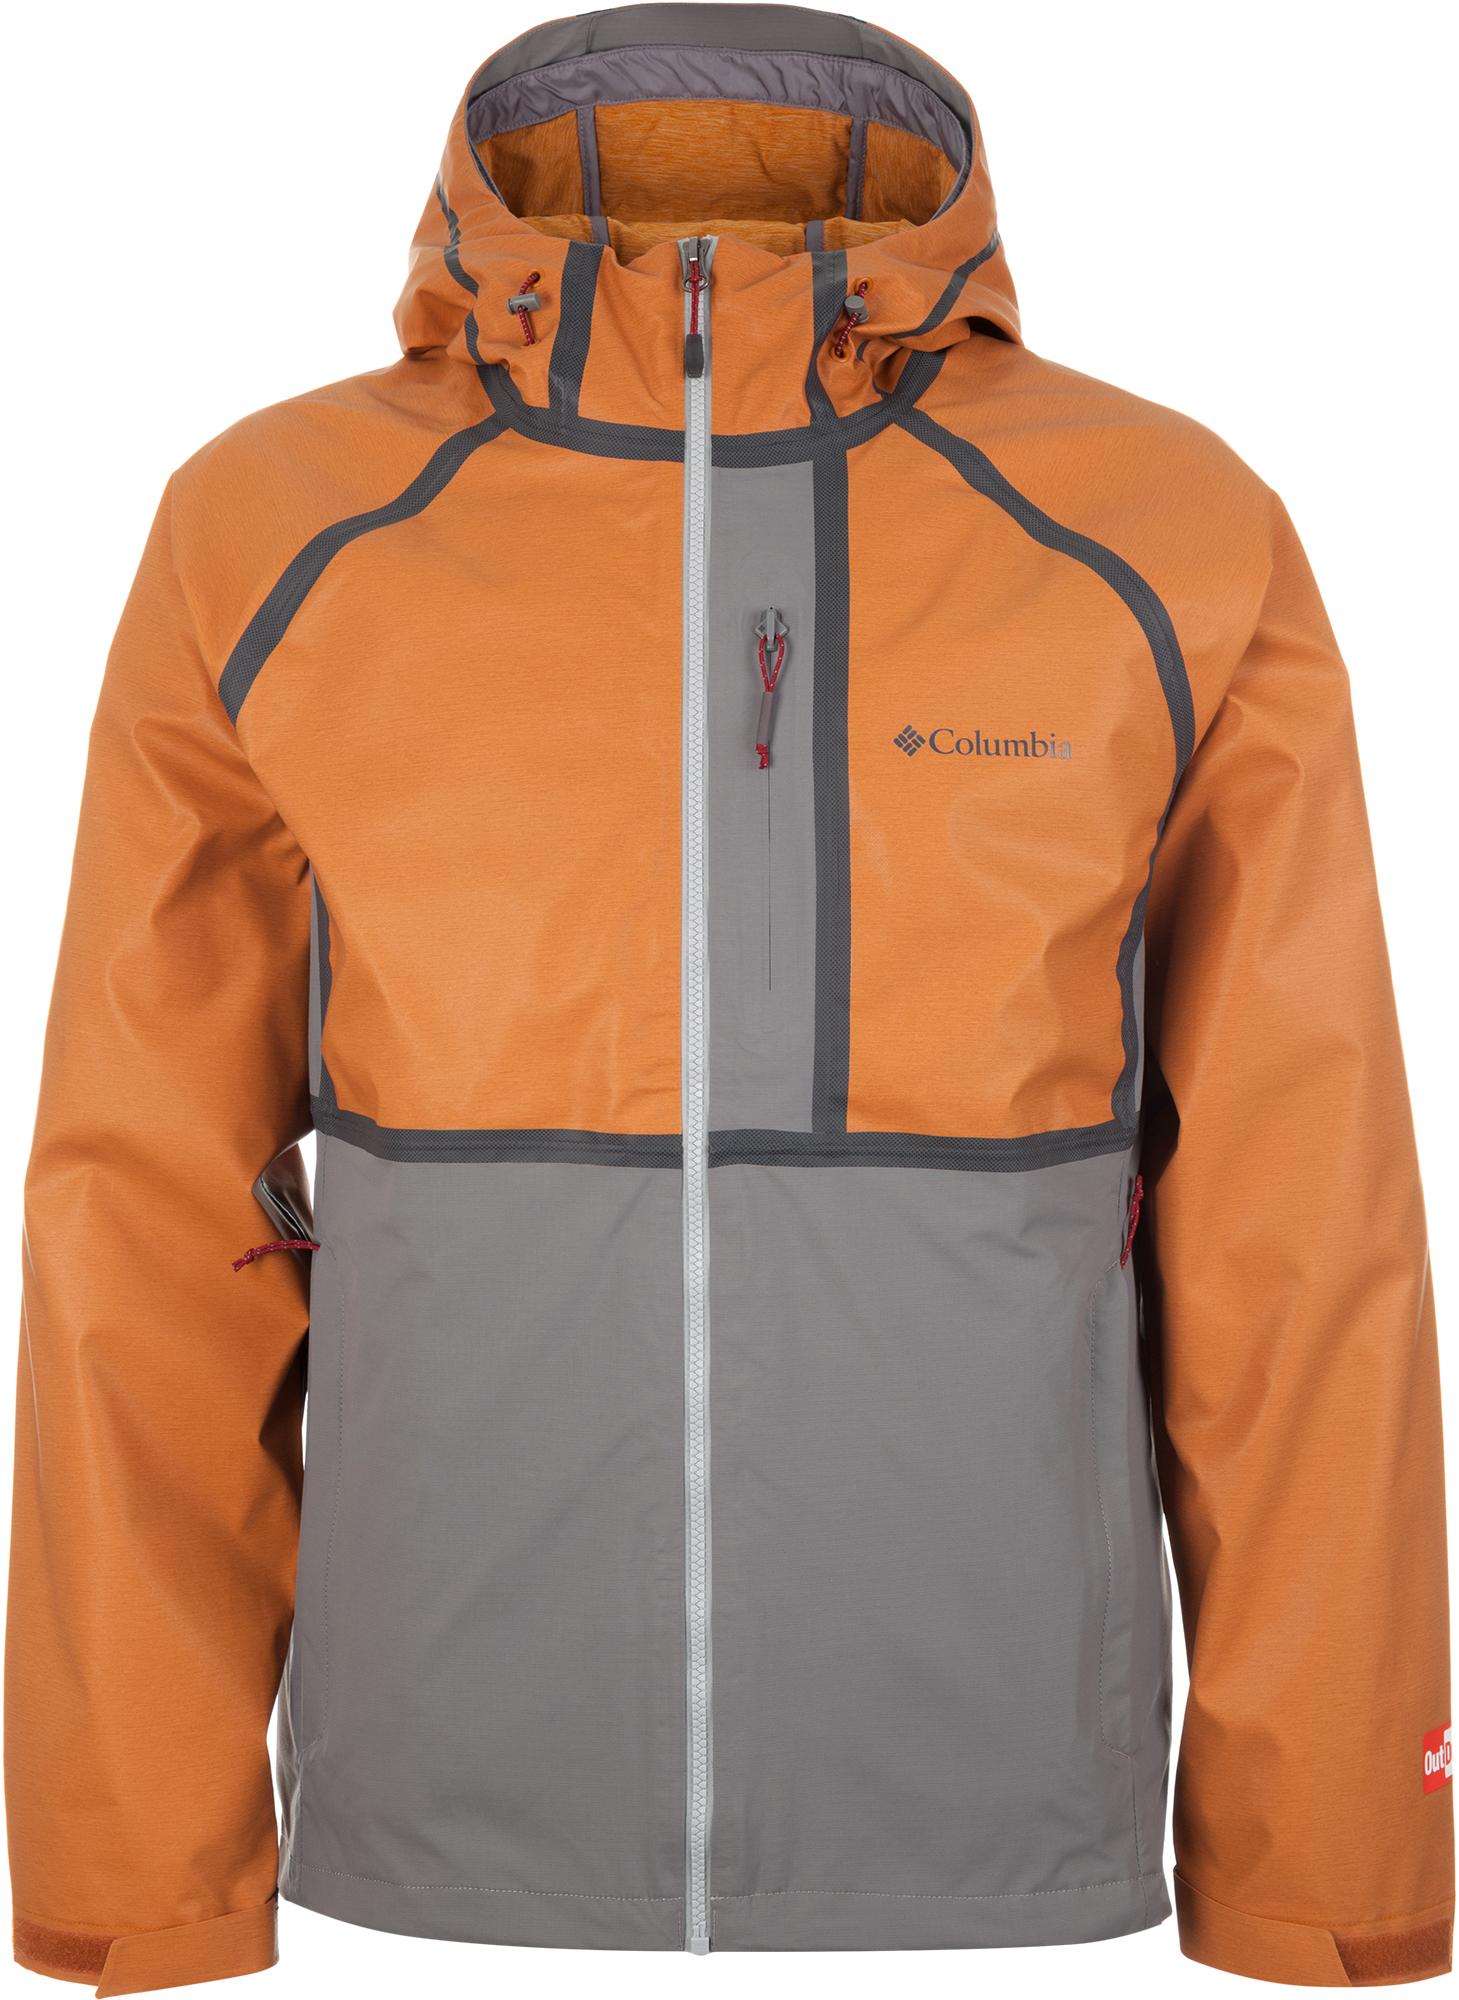 Columbia Куртка 3 в 1 мужская Columbia OutDry Rogue, размер 52-54